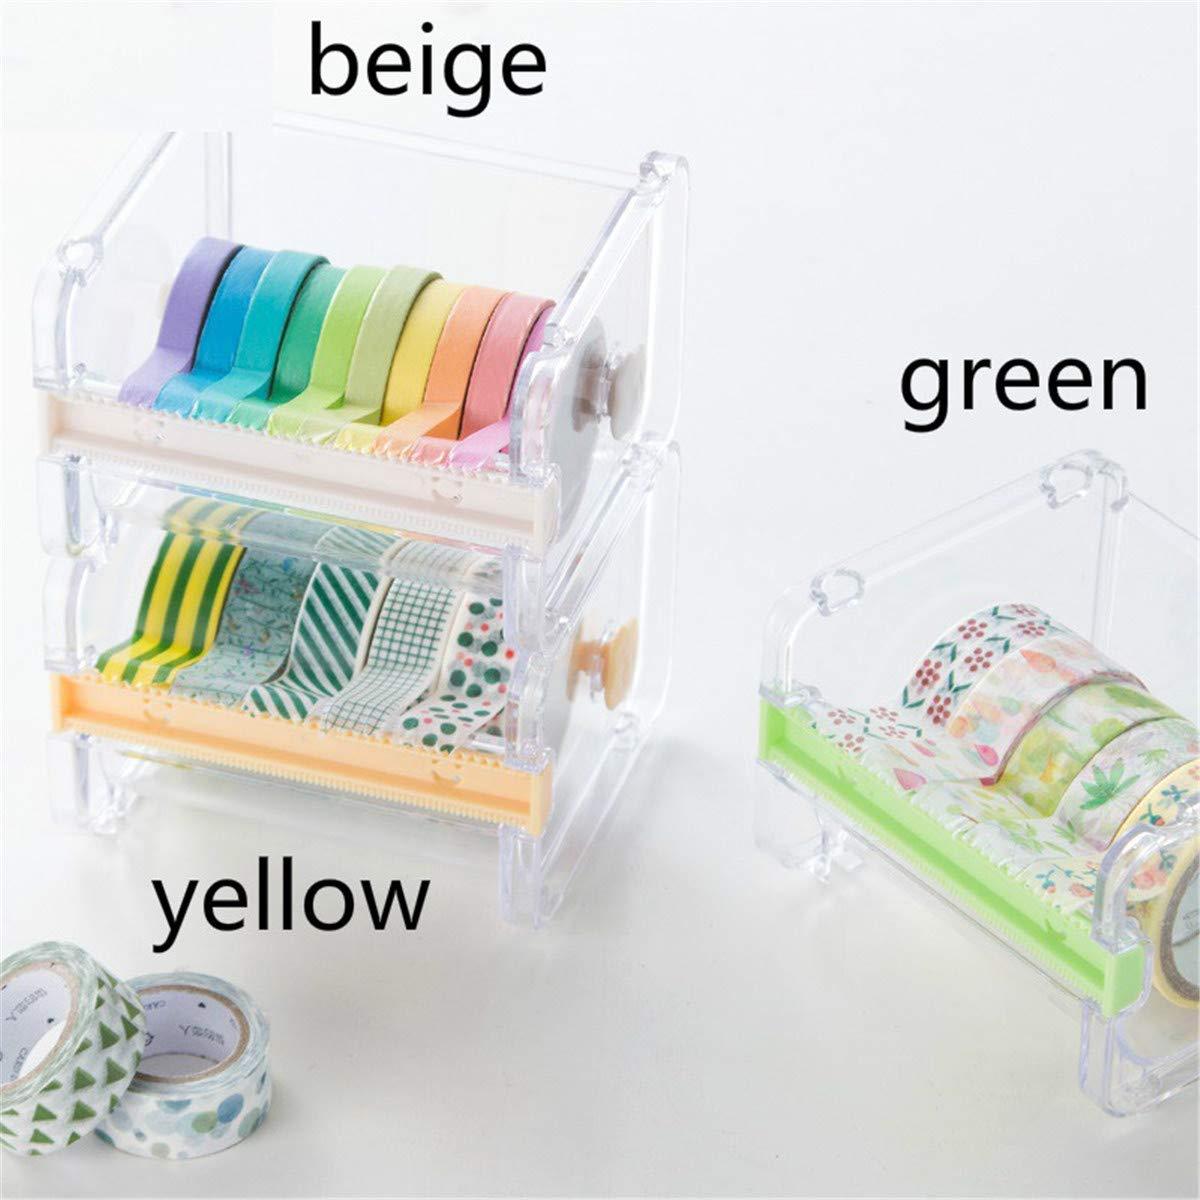 cinta adhesiva//cortadora de cinta transparente de escritorio con dispensador de cinta visible Decorativo decorativo japon/és Washi